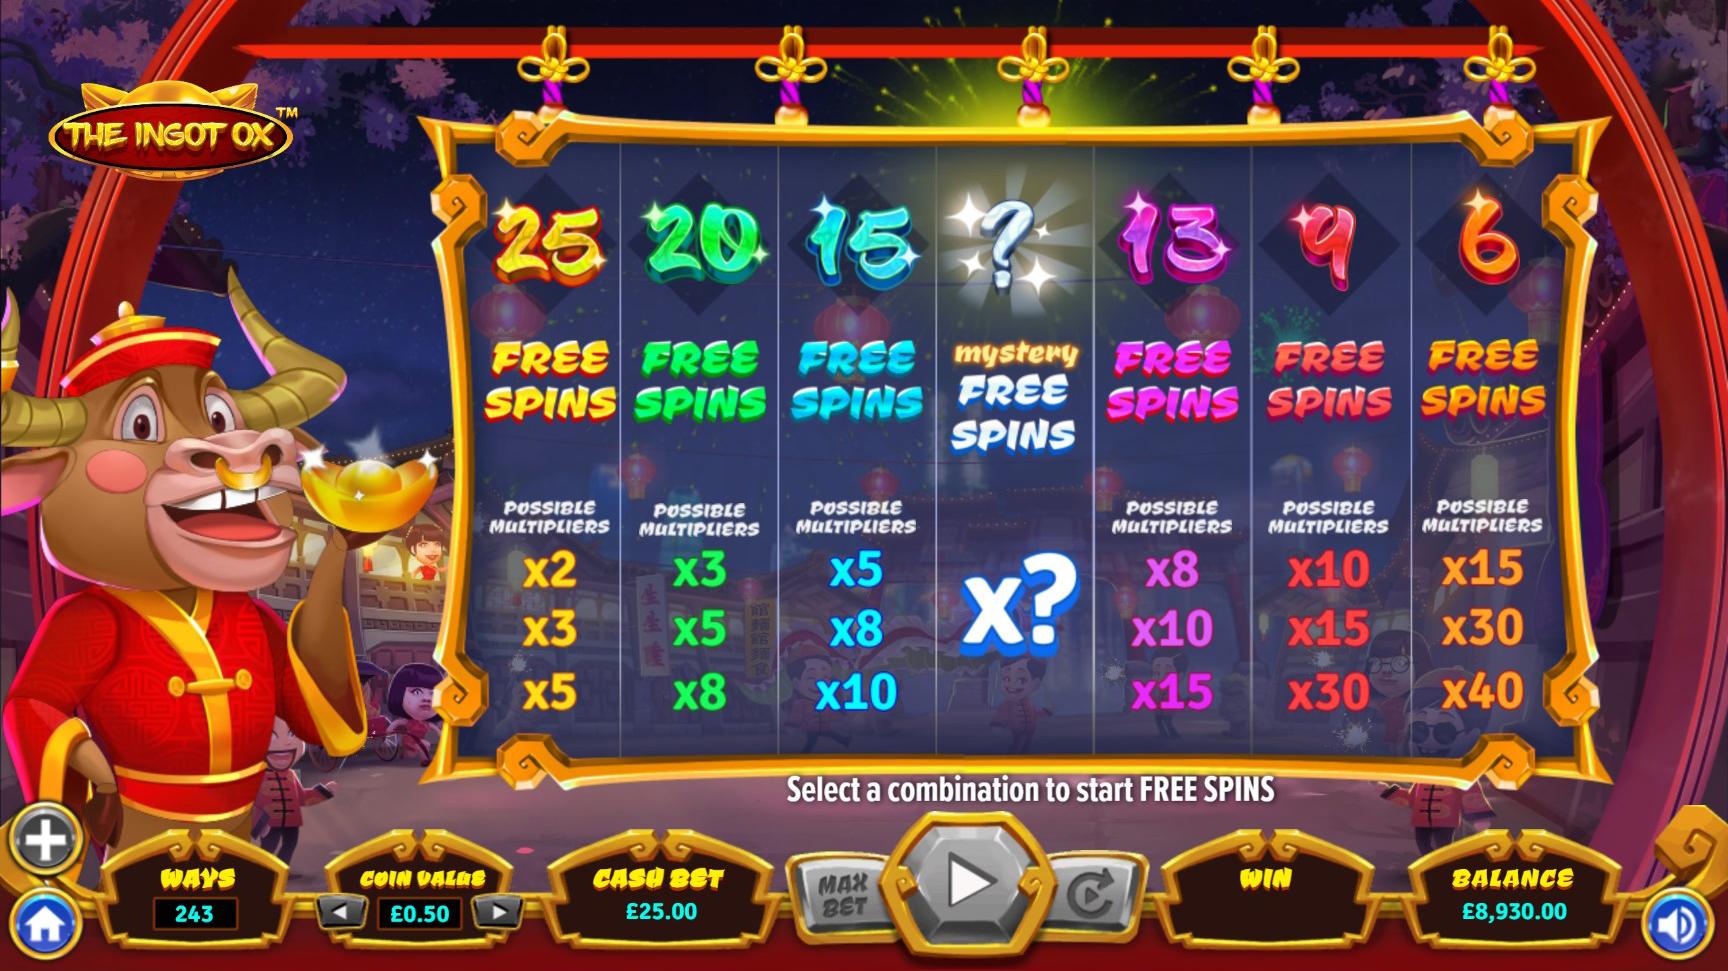 the ingot ox multiplier and bonus image